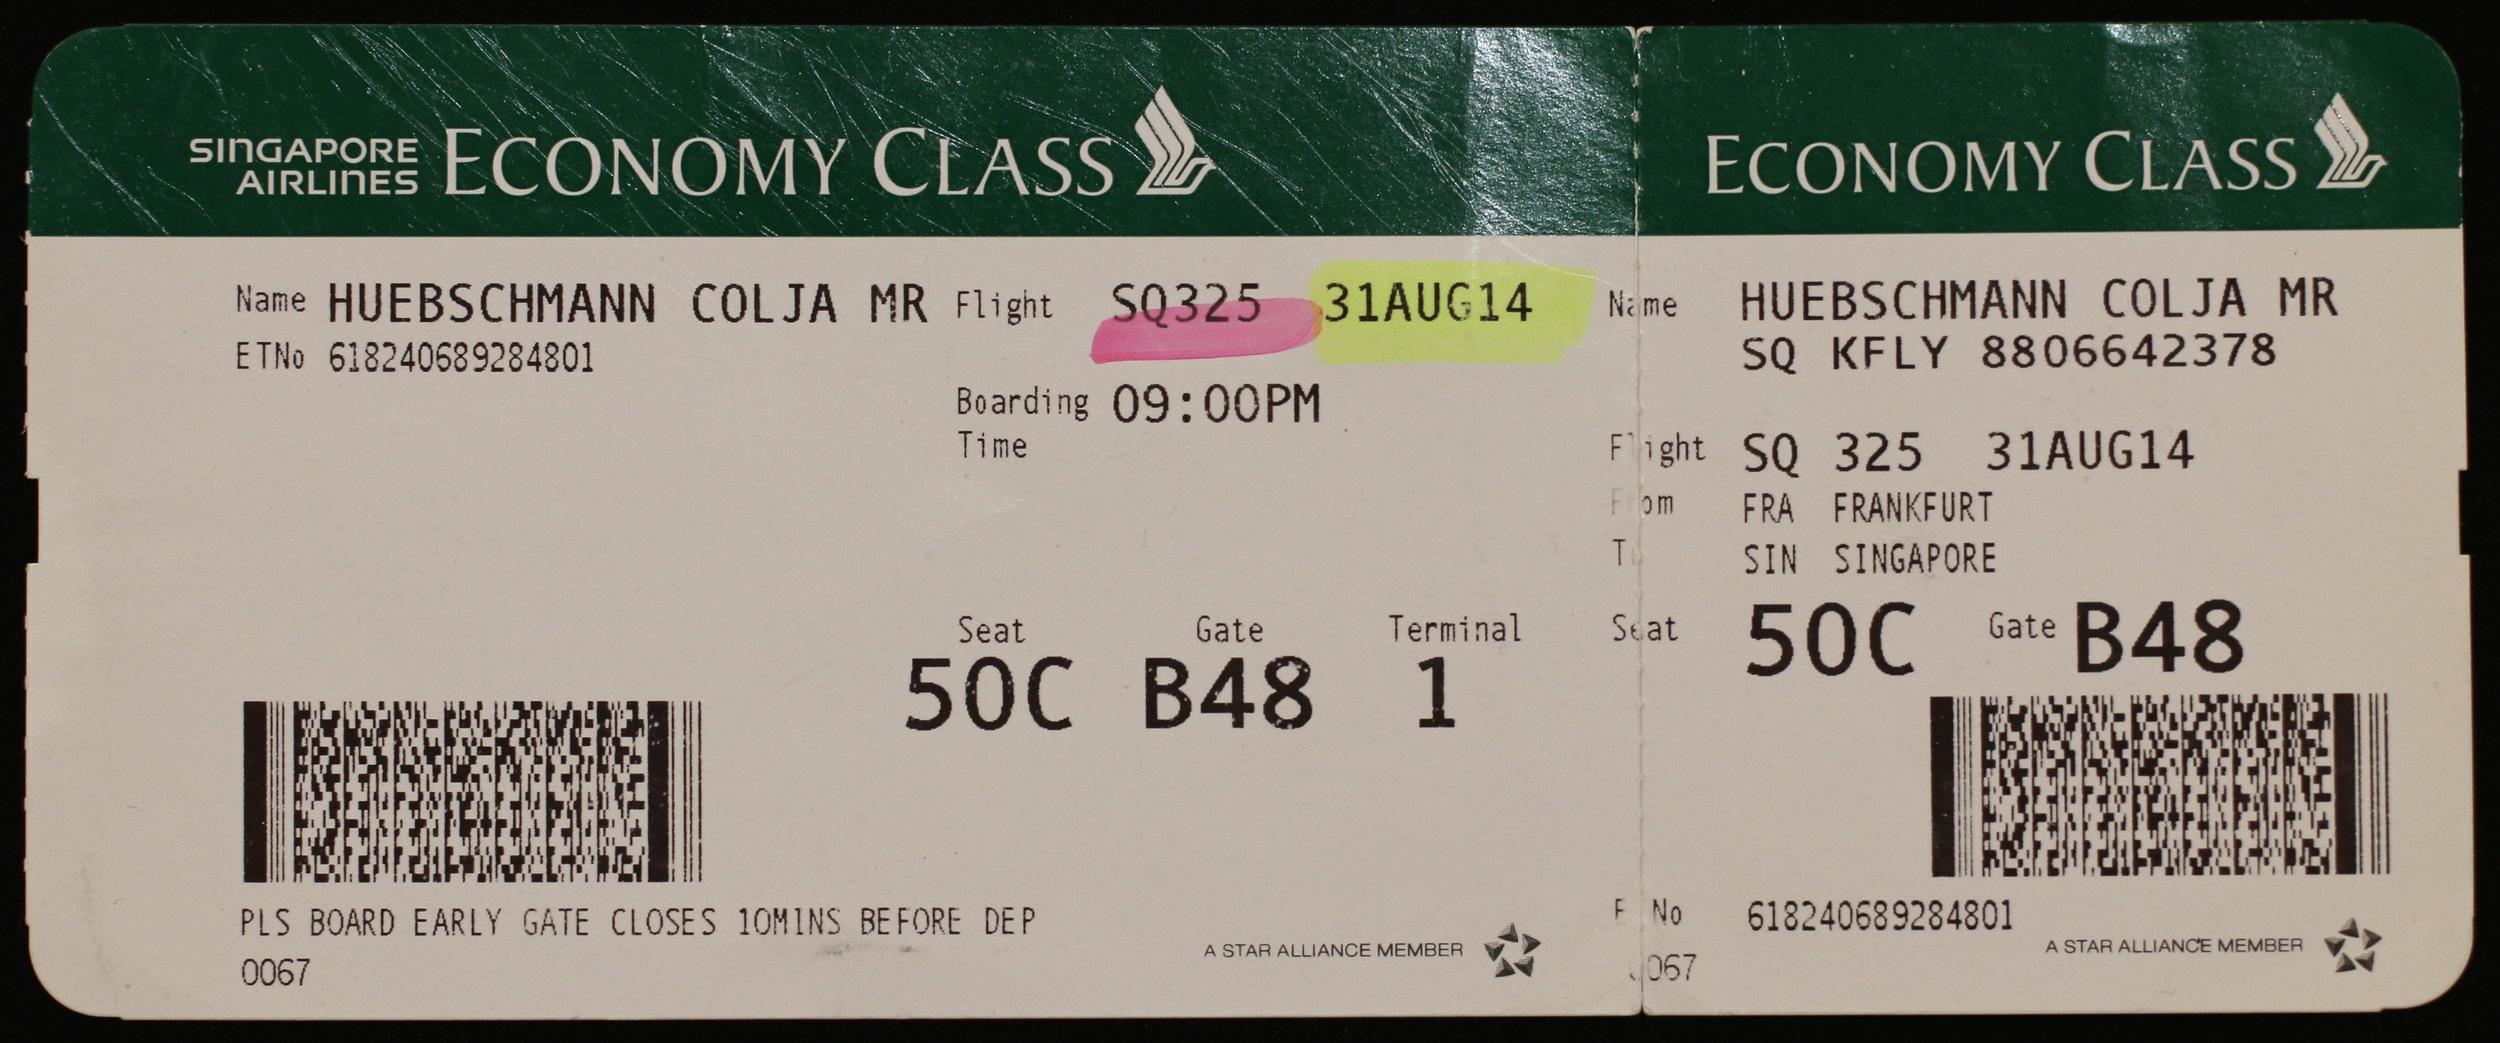 ticket FRA-SIN (31AUG14)